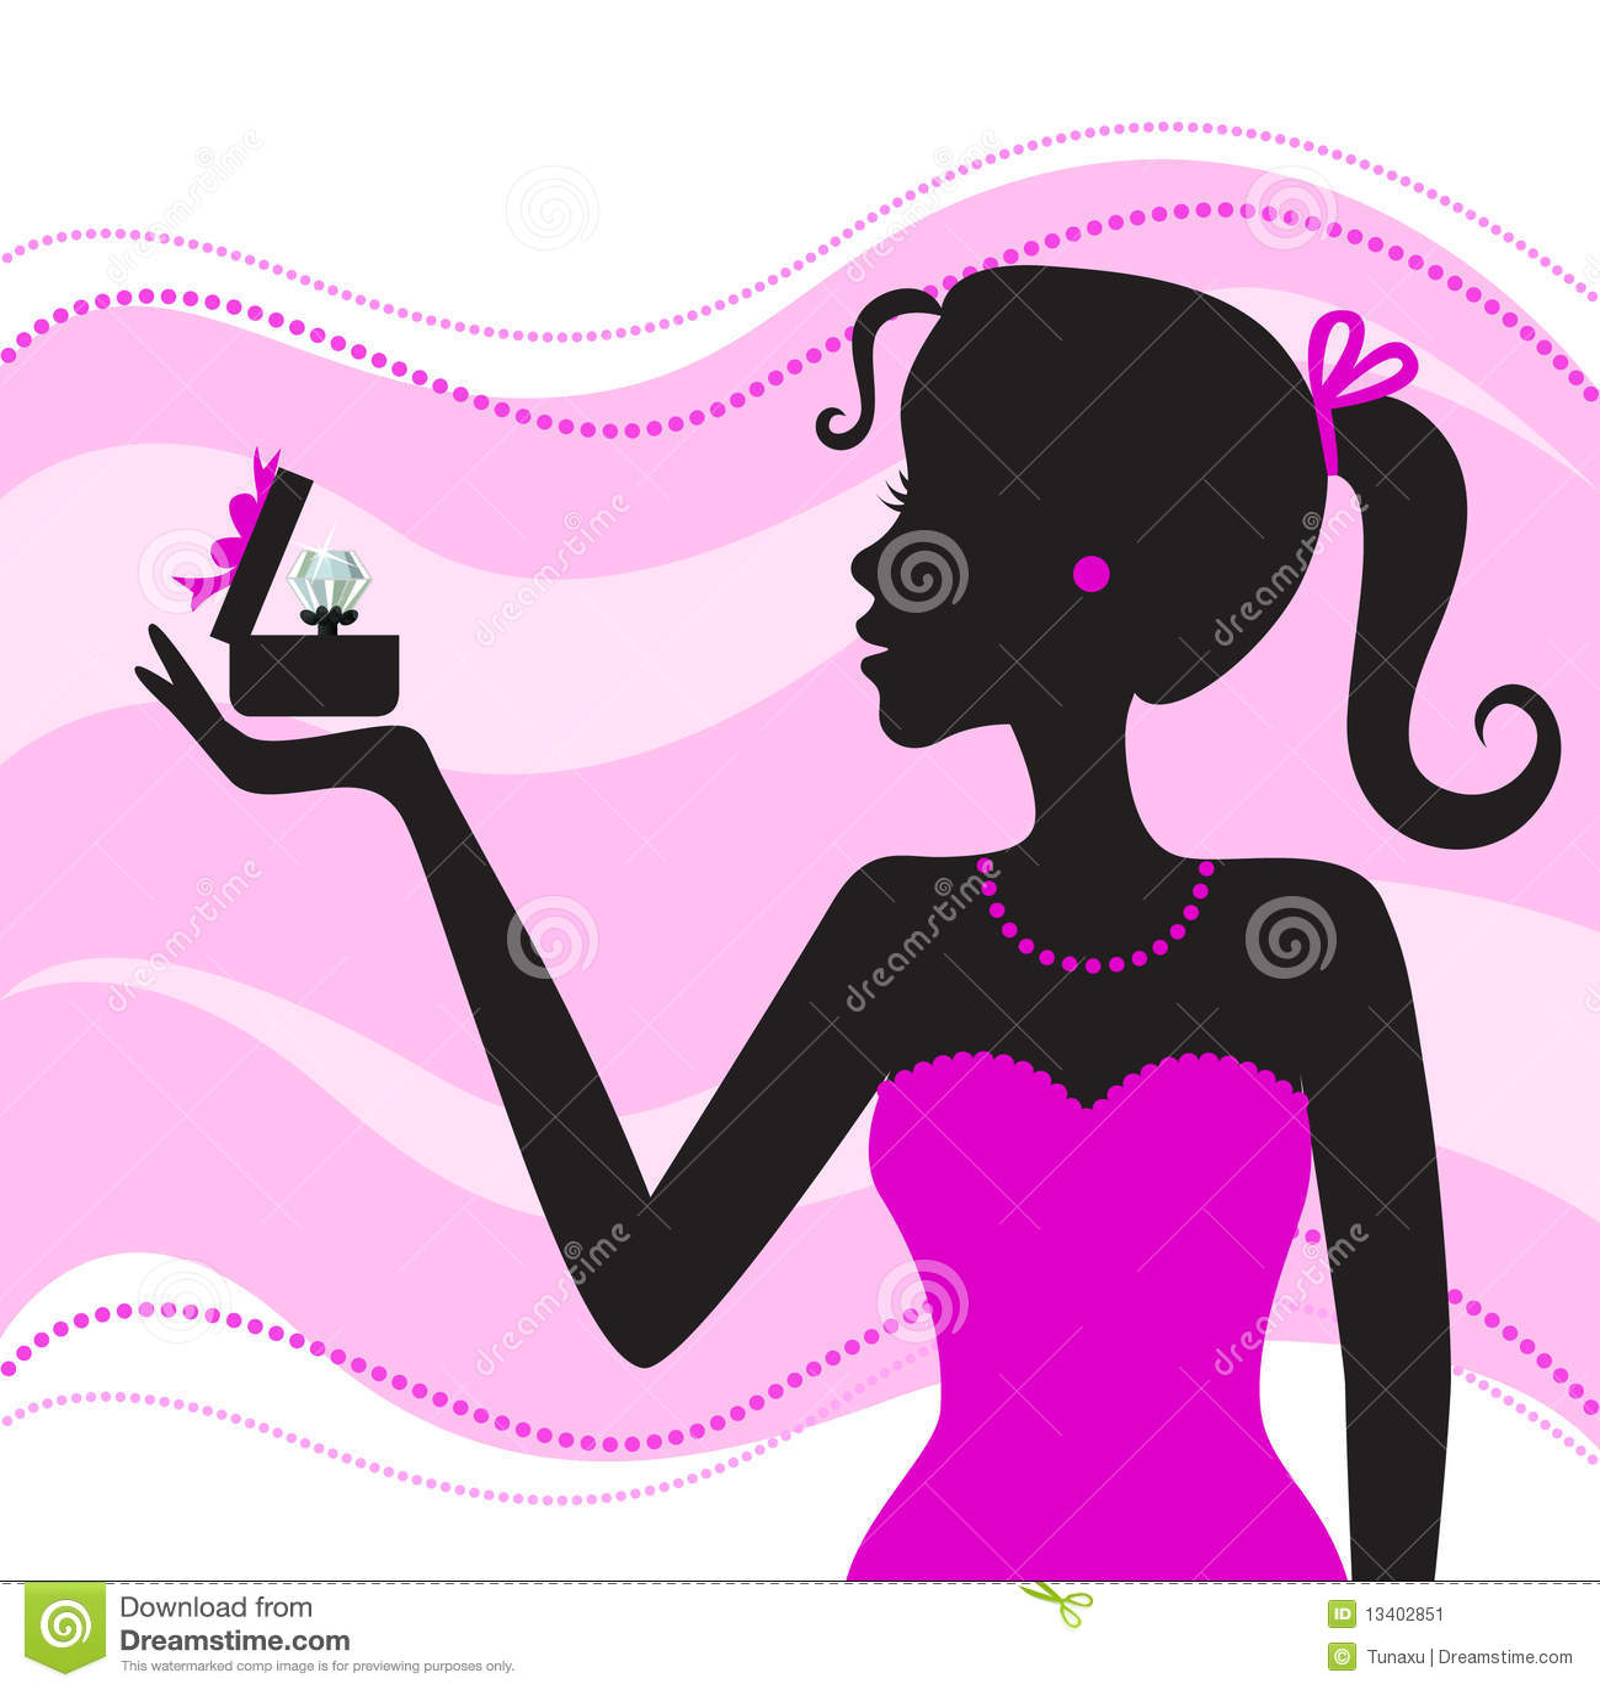 Diamond Box Xl >> Women with jewelry stock vector. Image of fashion, valentine - 13402851